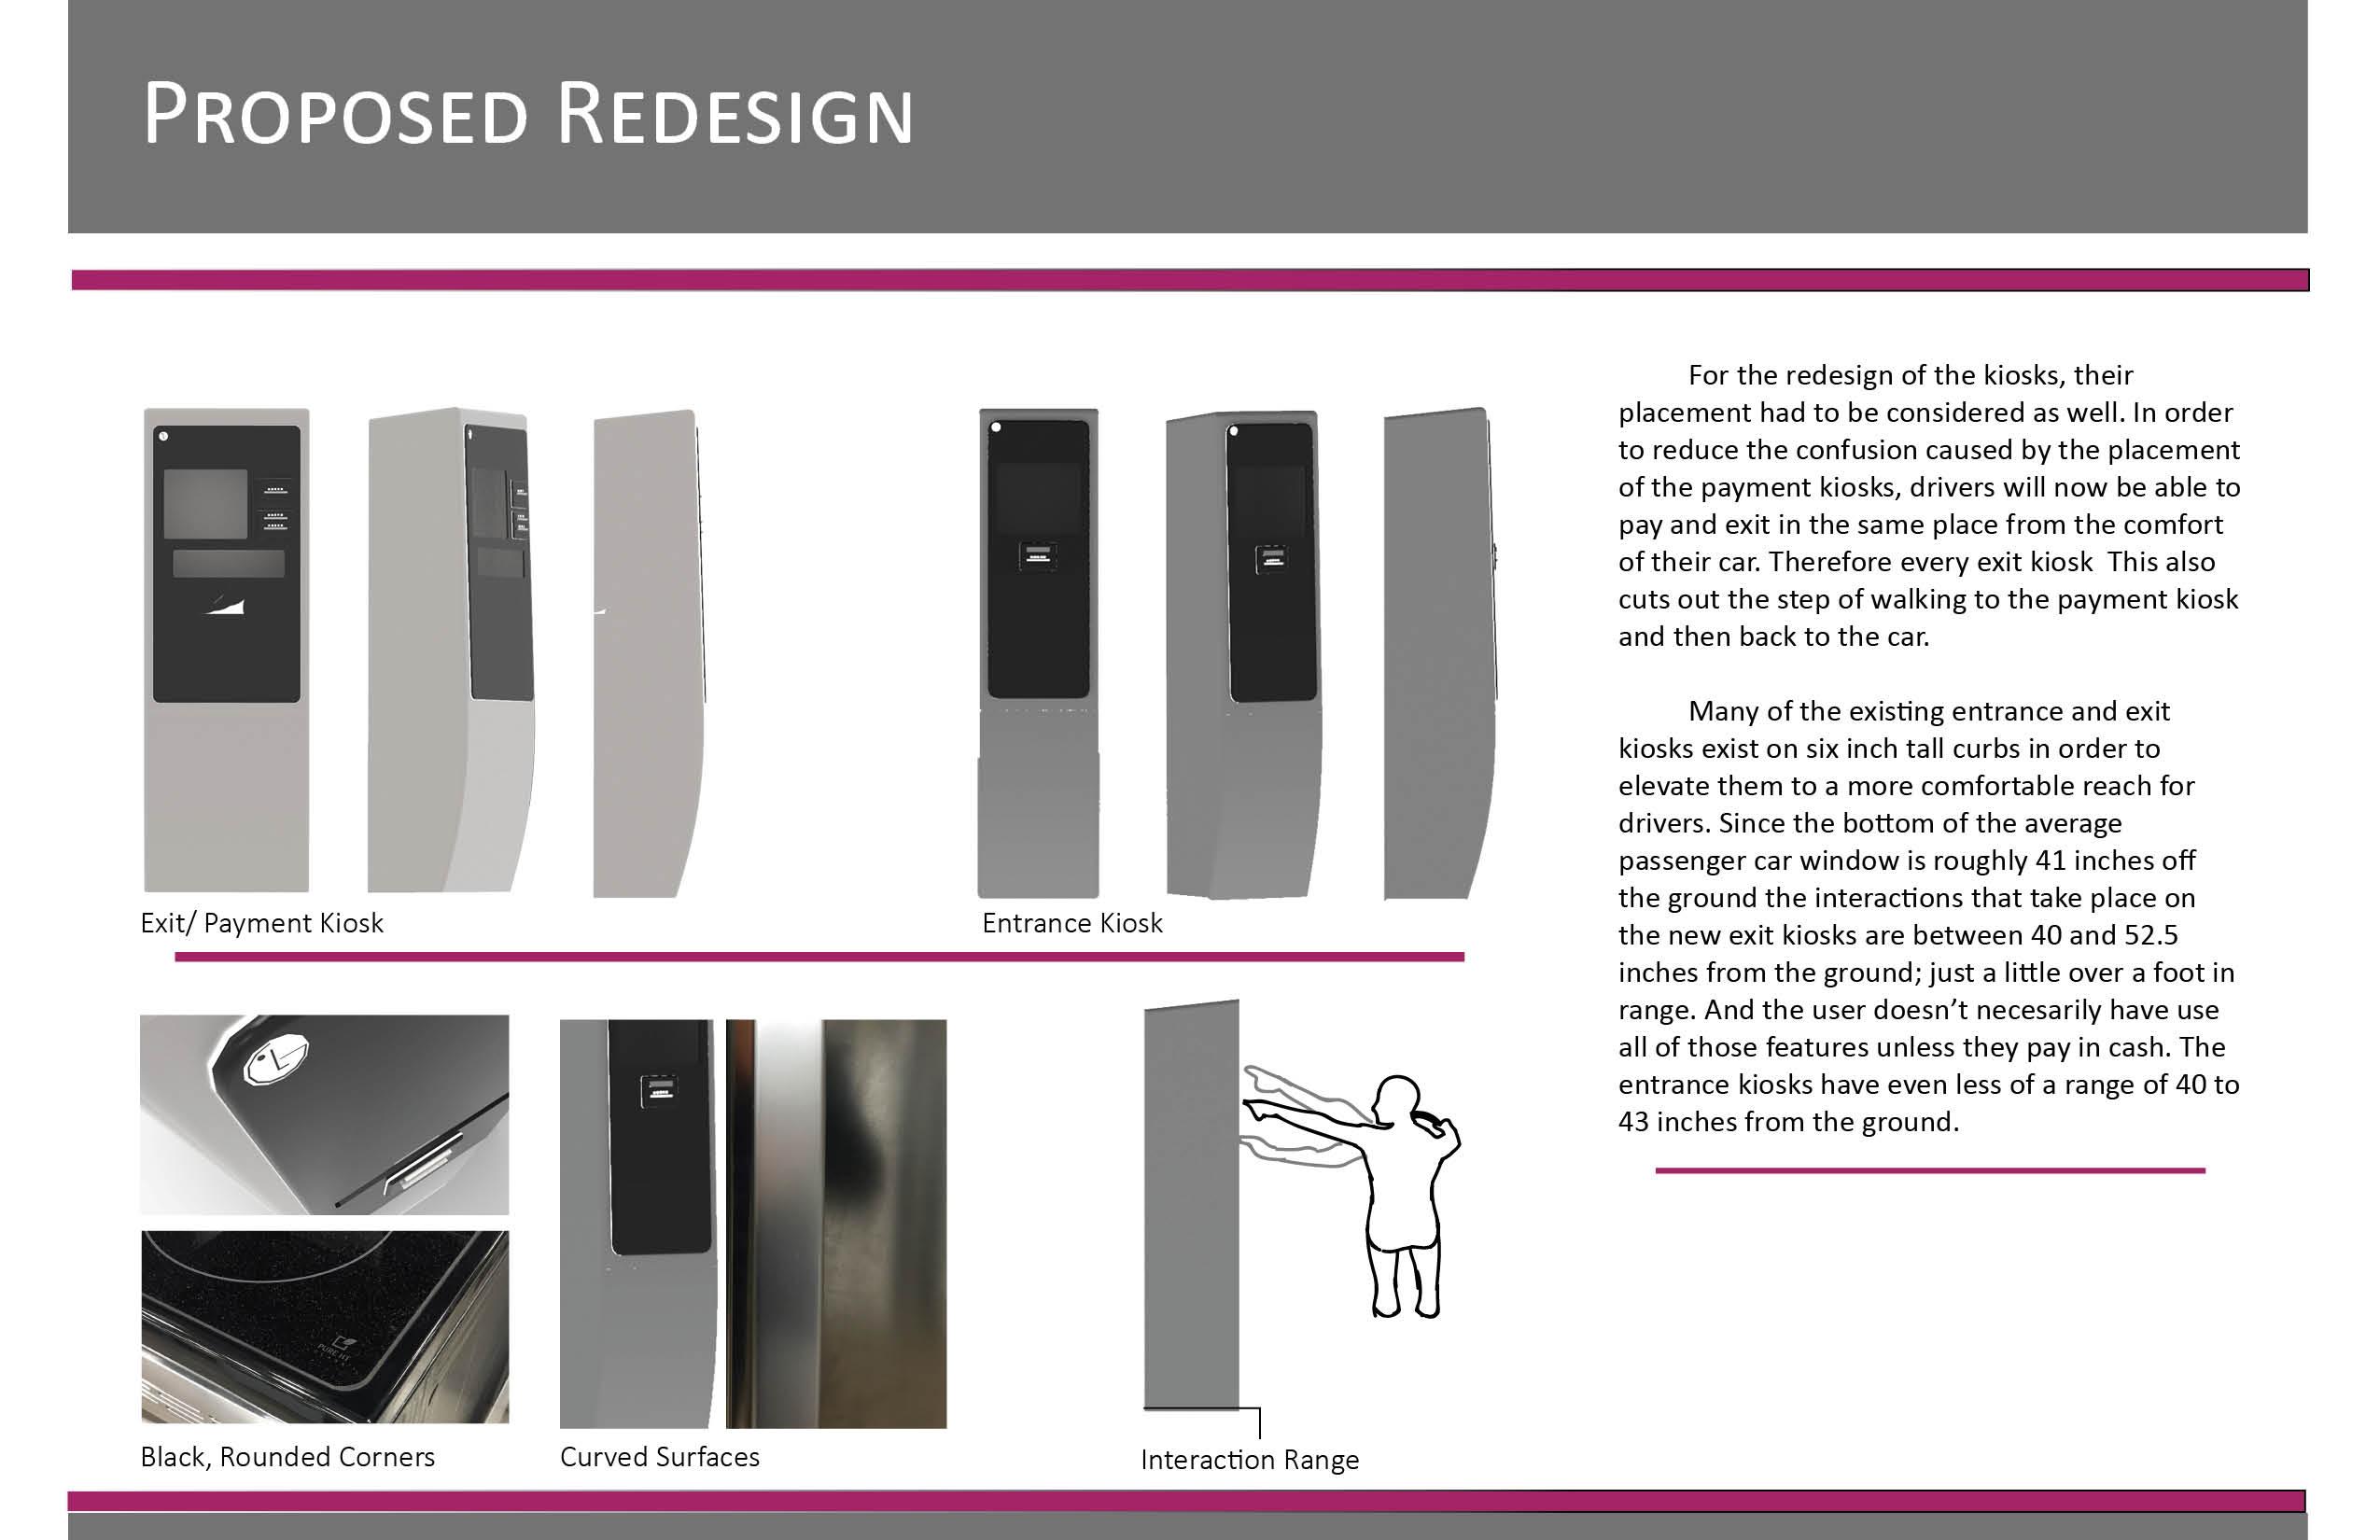 UX and brand design LG Ticket kiosk